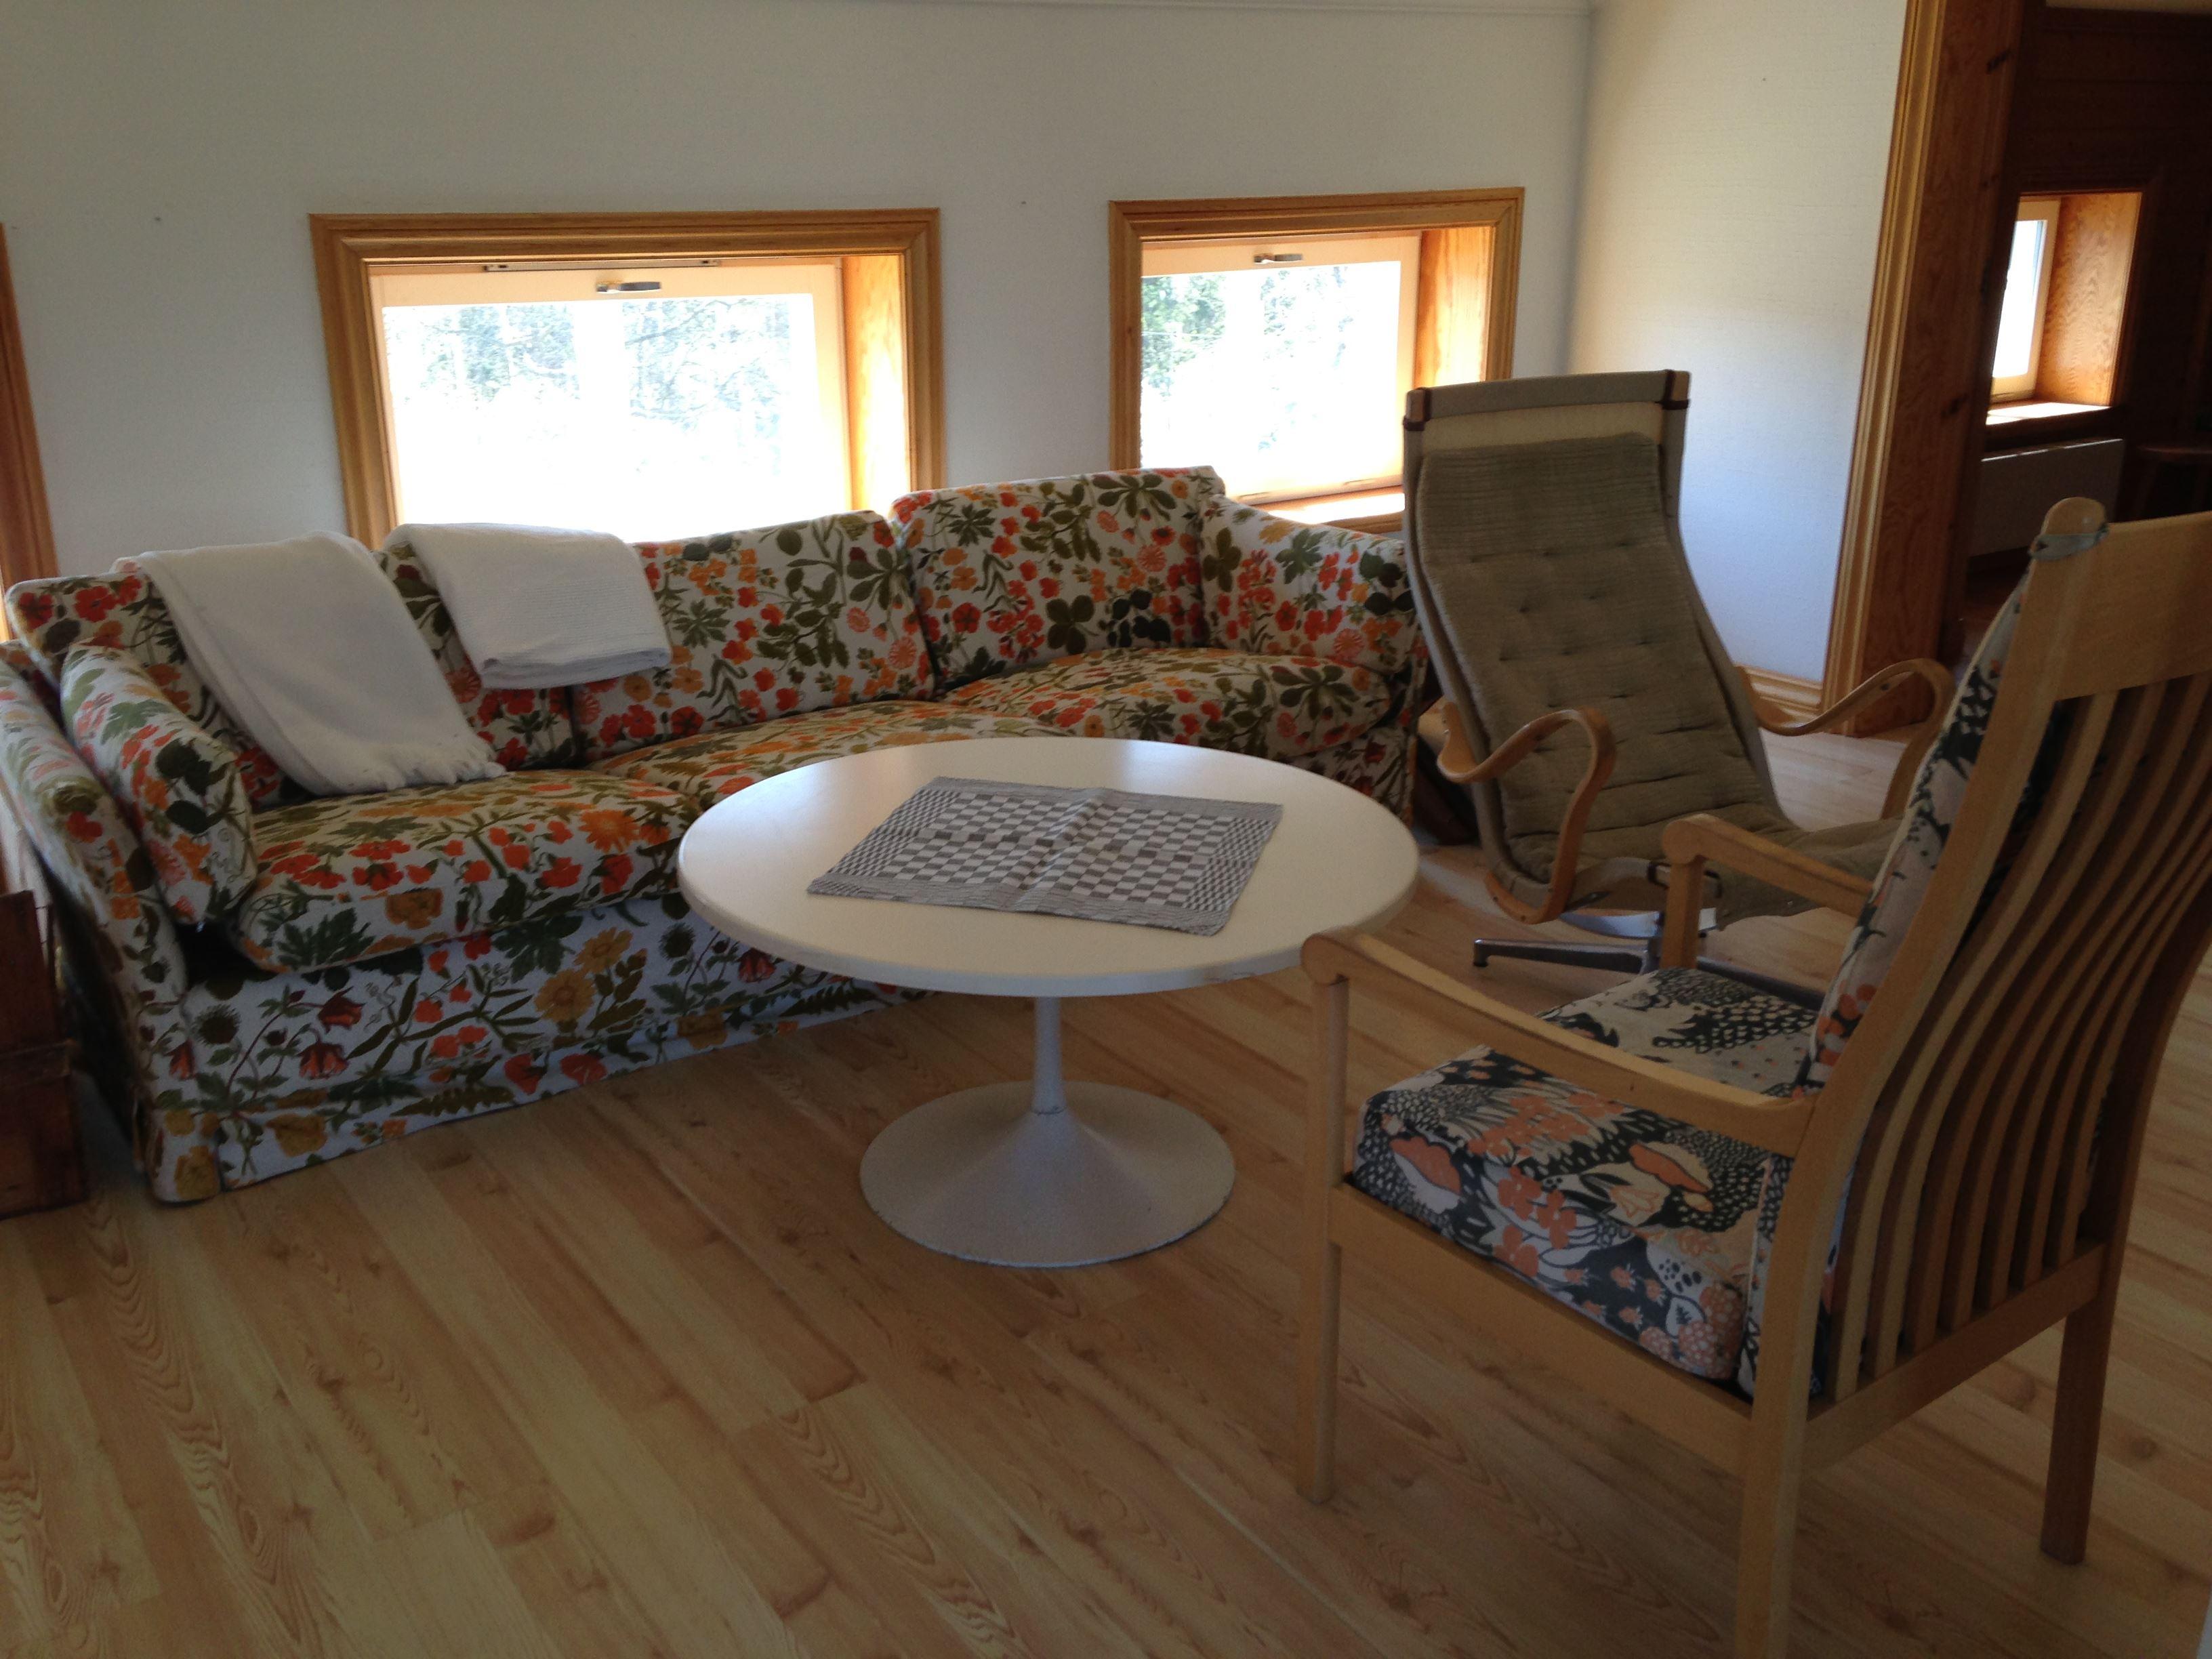 Storholmen's room accommodation on a farm